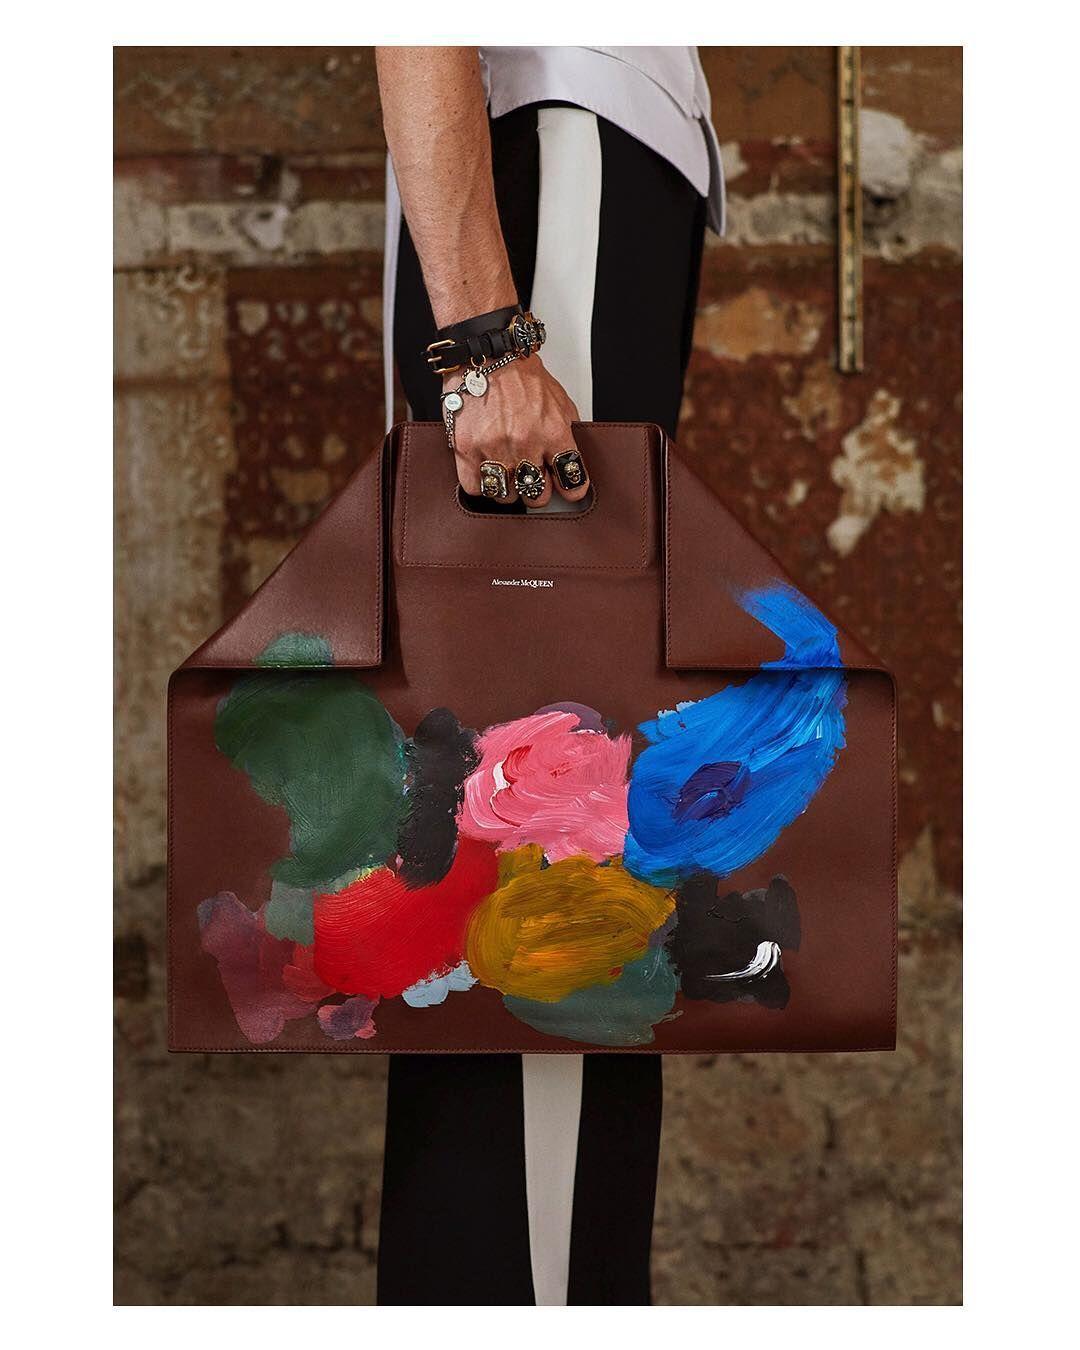 "eb0a1f5e1 Alexander McQueen on Instagram  ""A Demanta Shopper with an artist s  palette-inspired print. From the Alexander McQueen Spring Summer 2019  menswear ..."